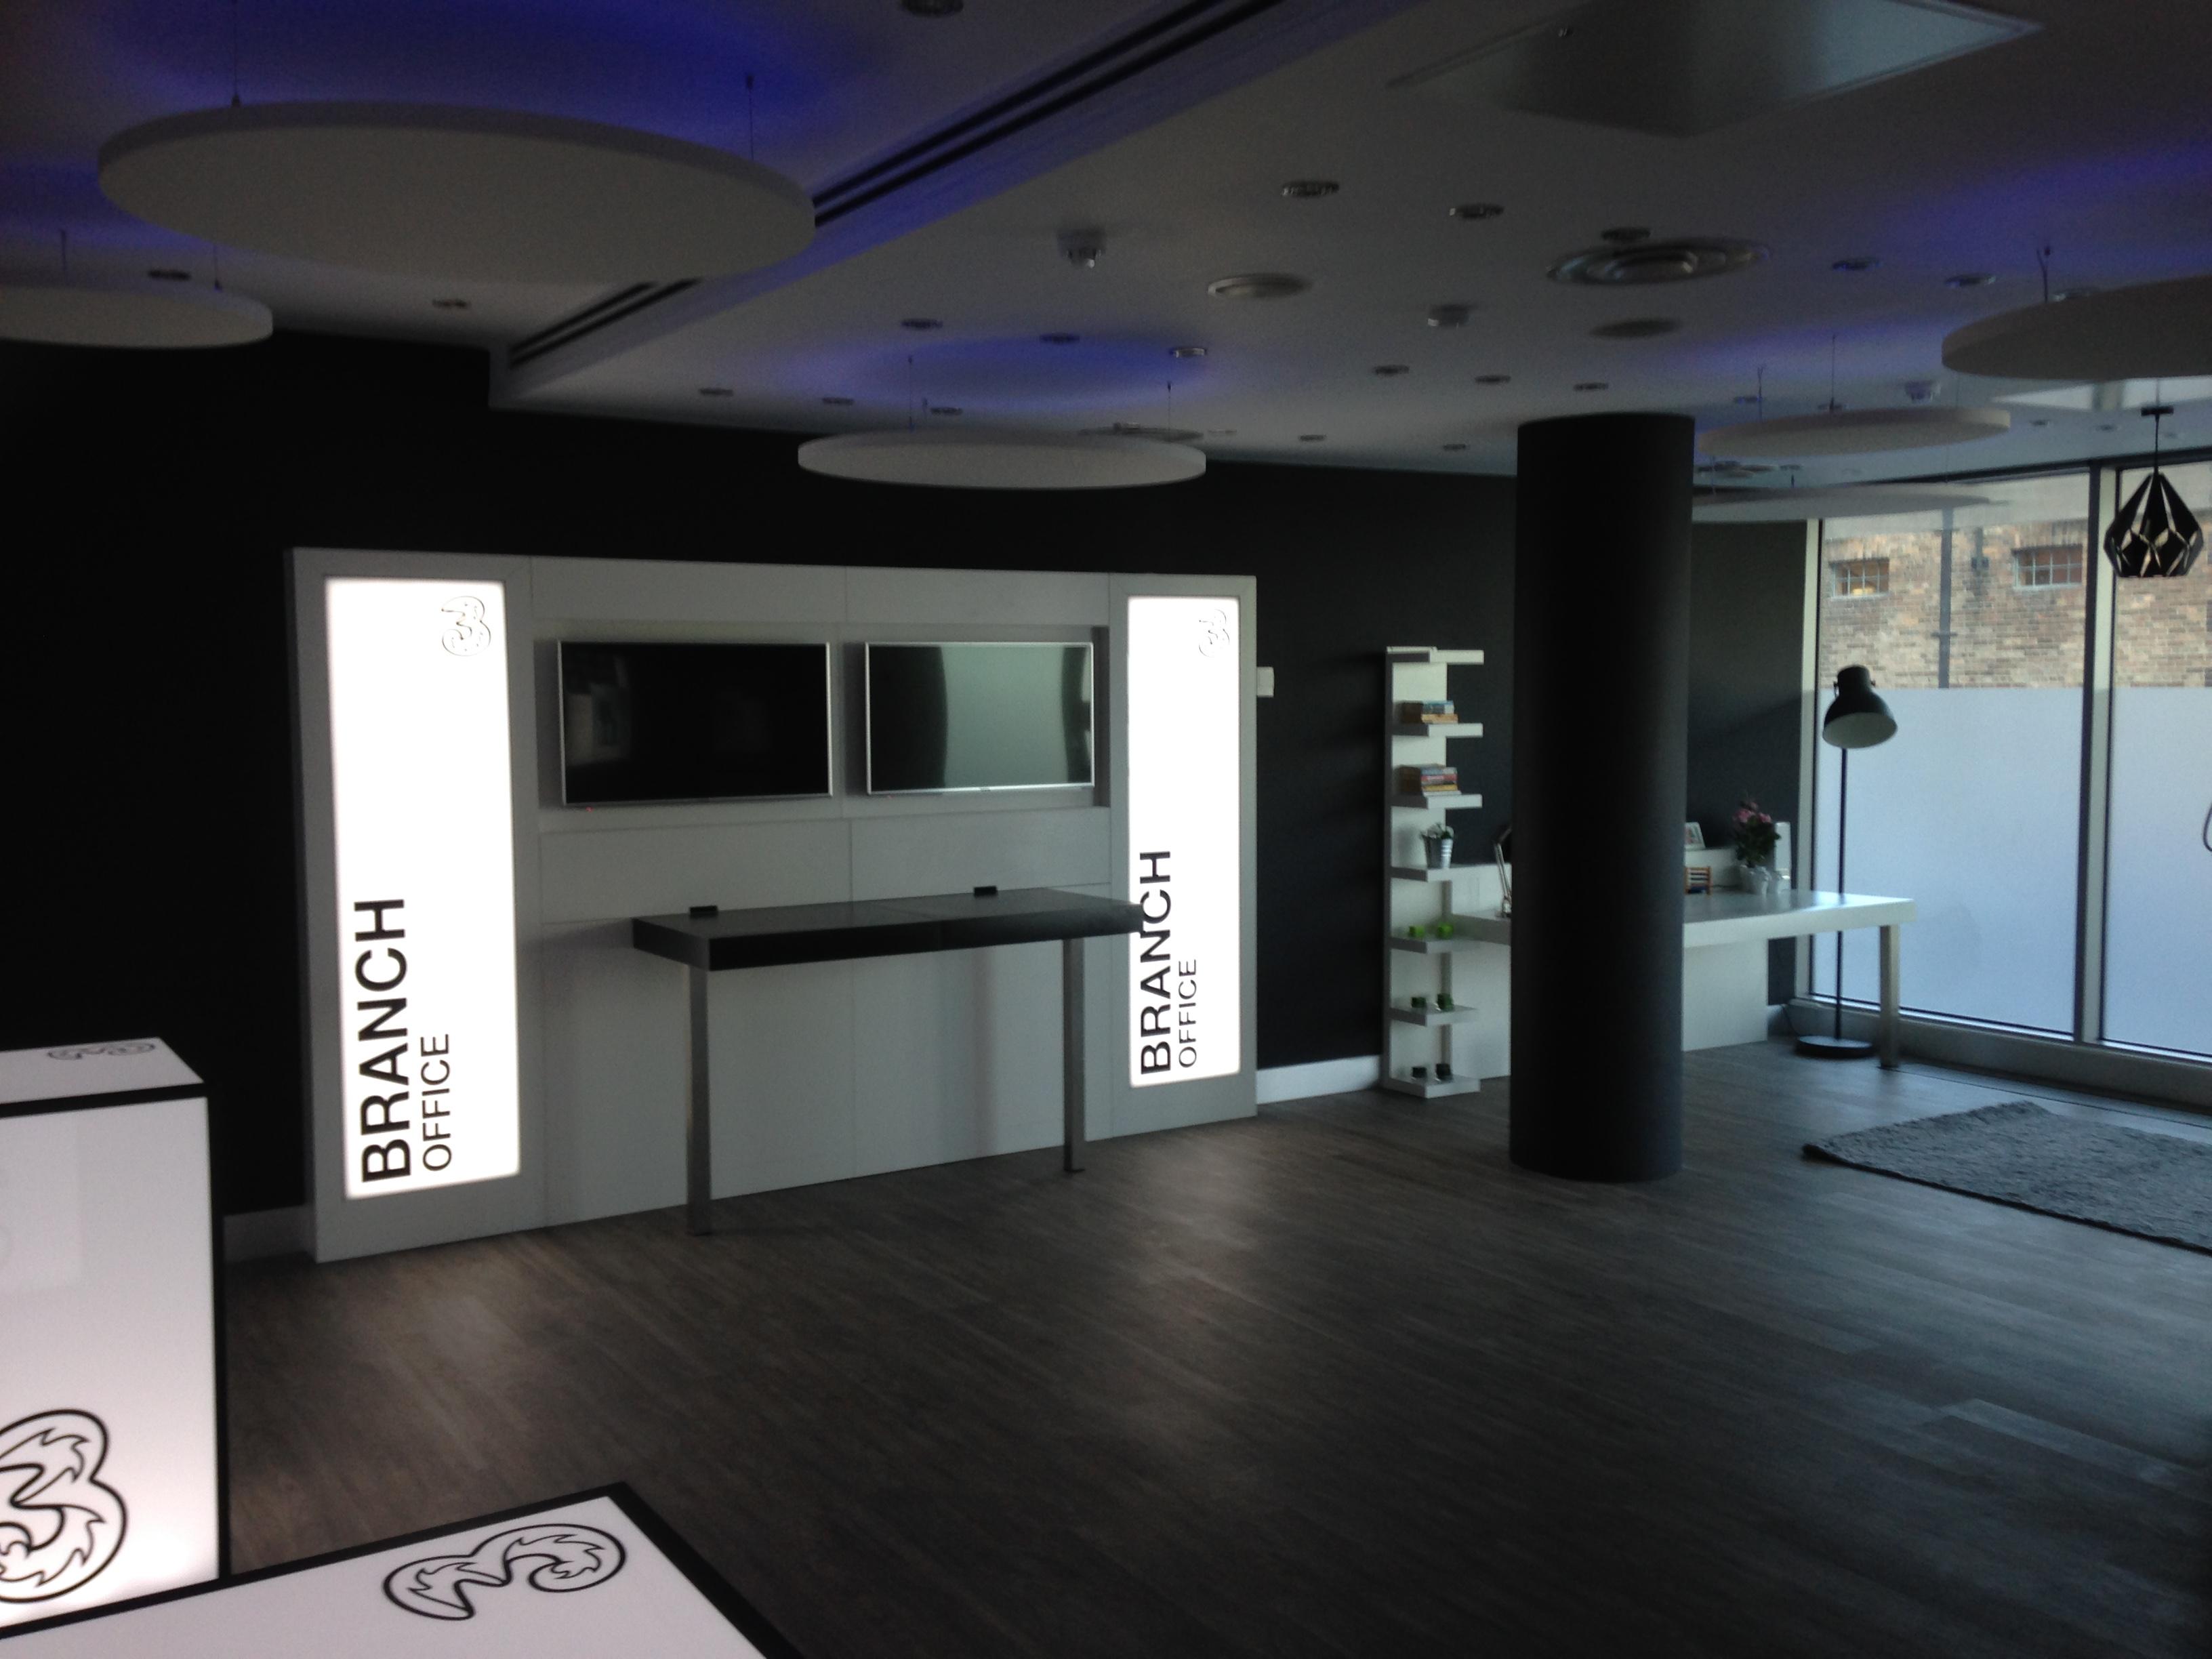 Shop-Fitting-Three-Customer-Experience-Room